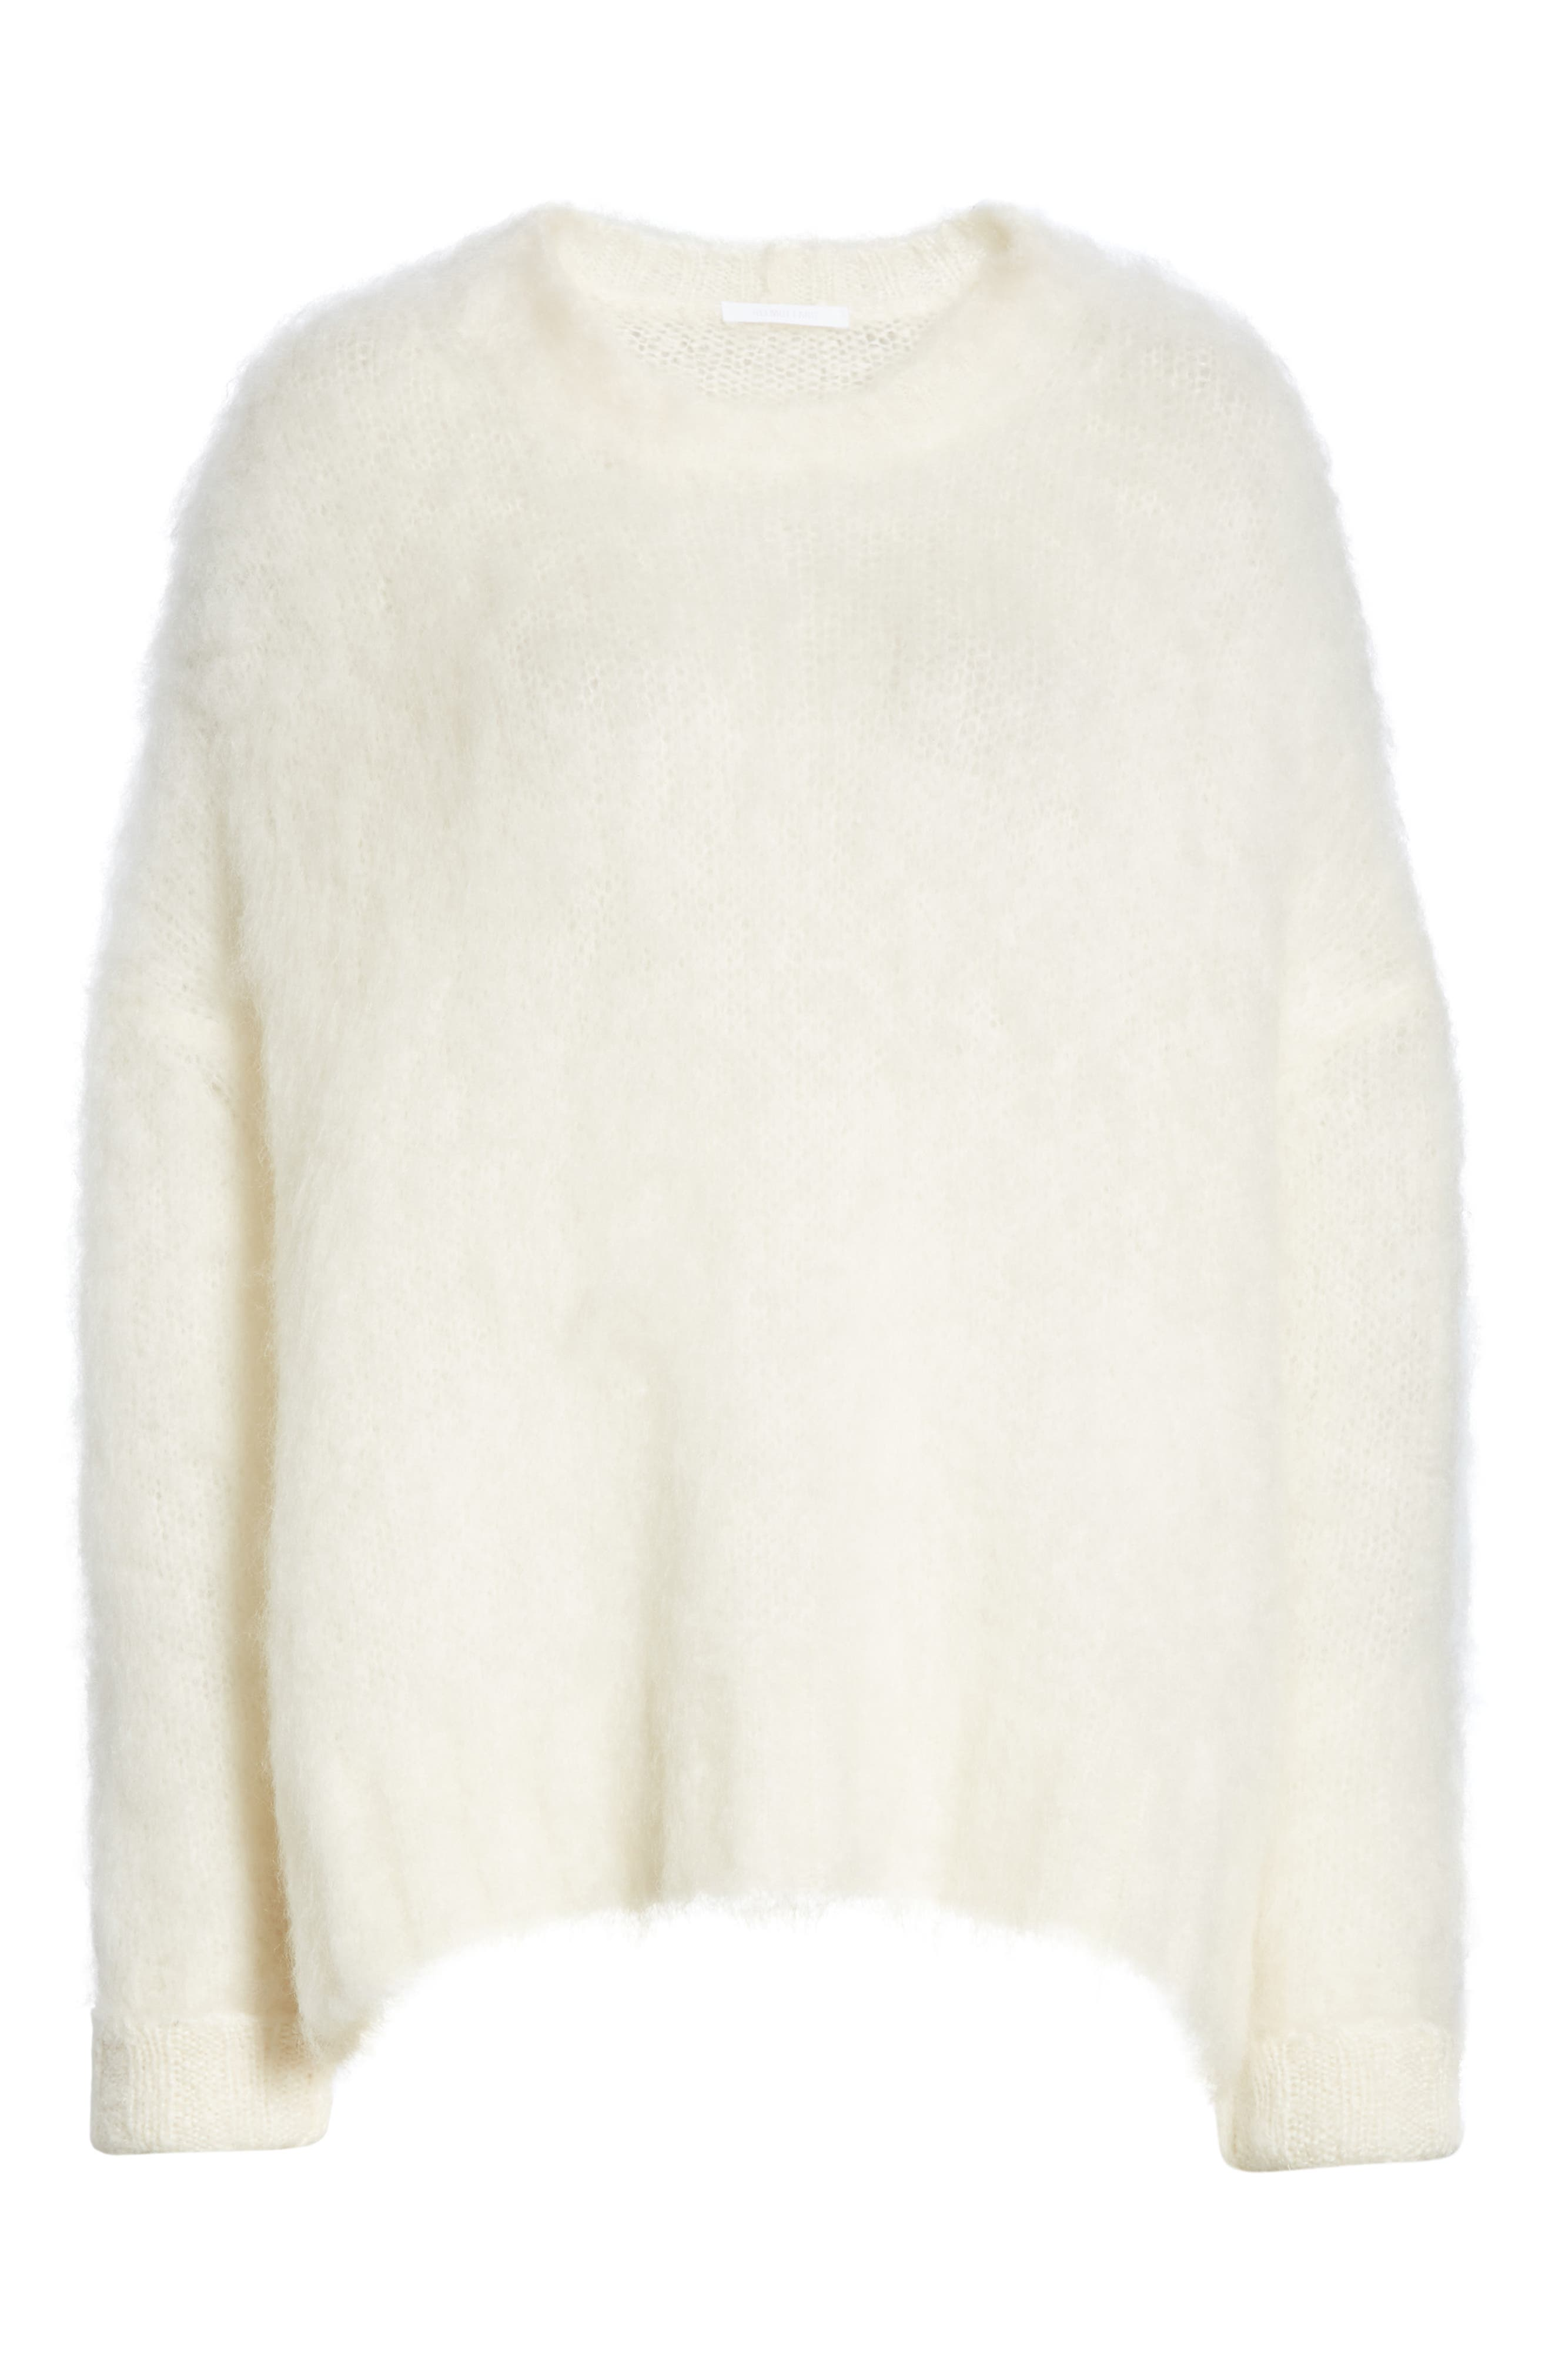 HELMUT LANG, Mohair Blend Sweater, Alternate thumbnail 6, color, NATURAL WHITE